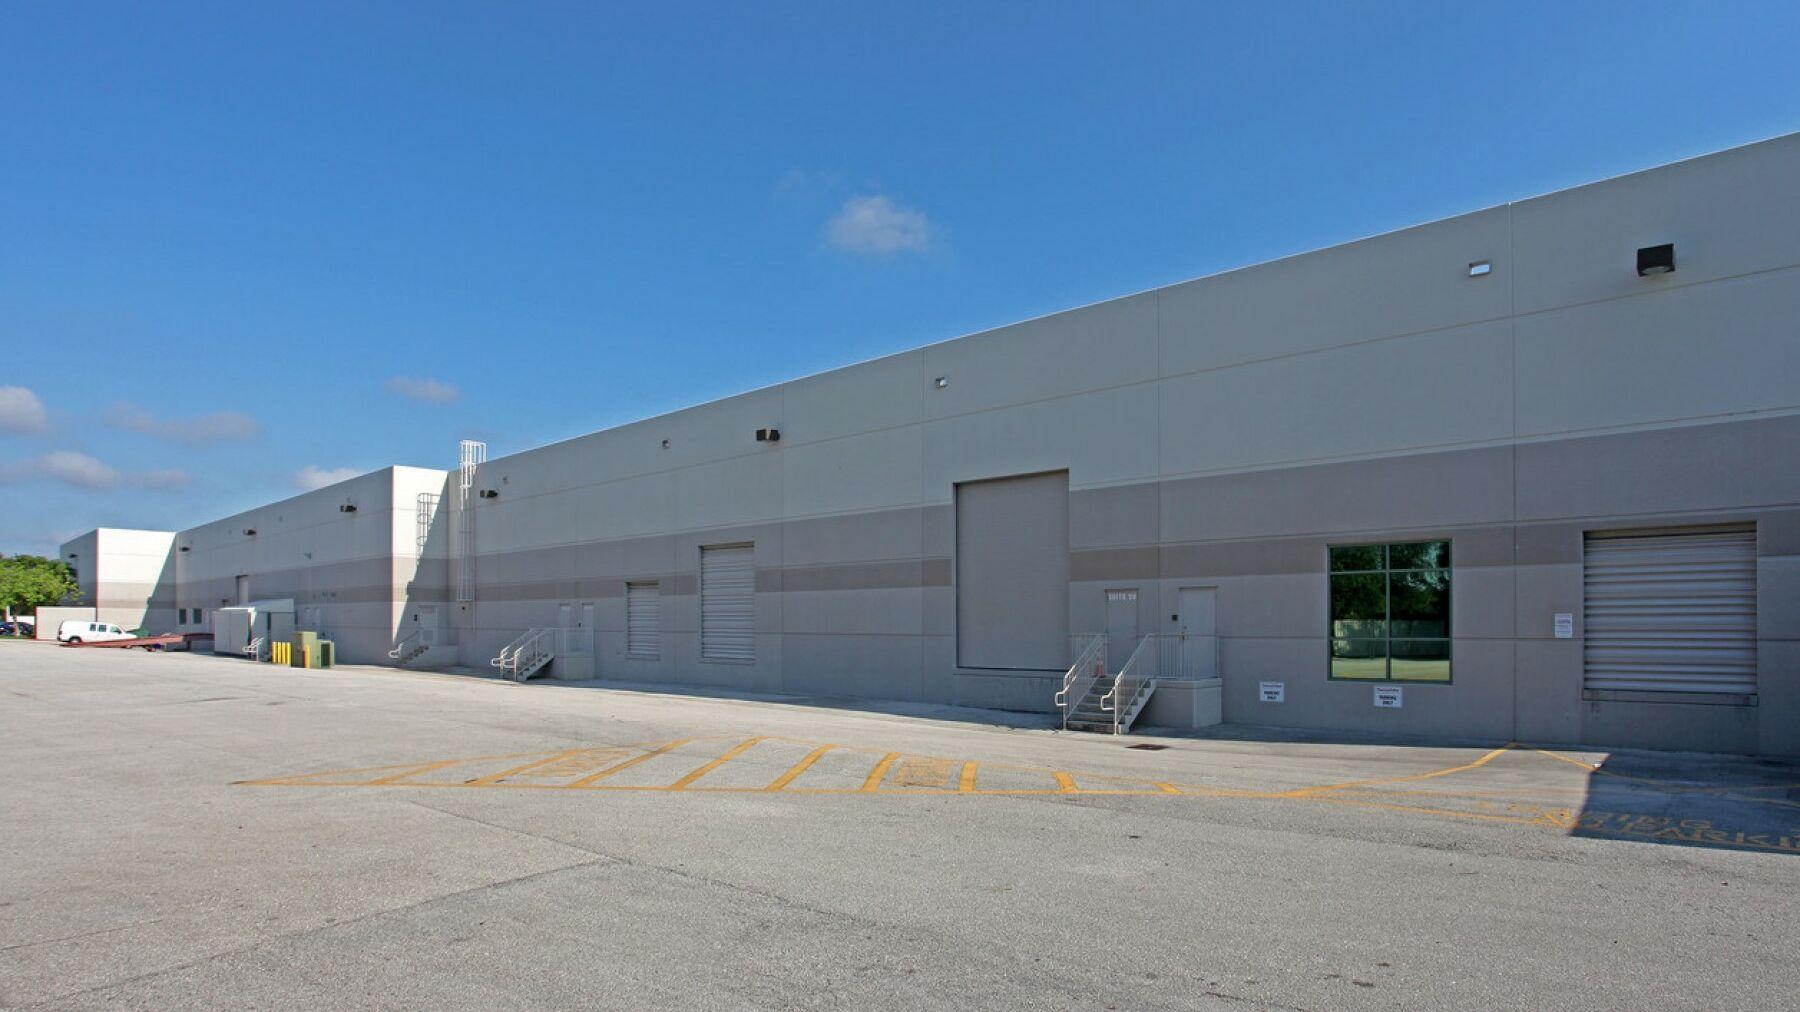 DPM-PBC01003-Northpoint-1400-Dock-Doors-Photo.jpg